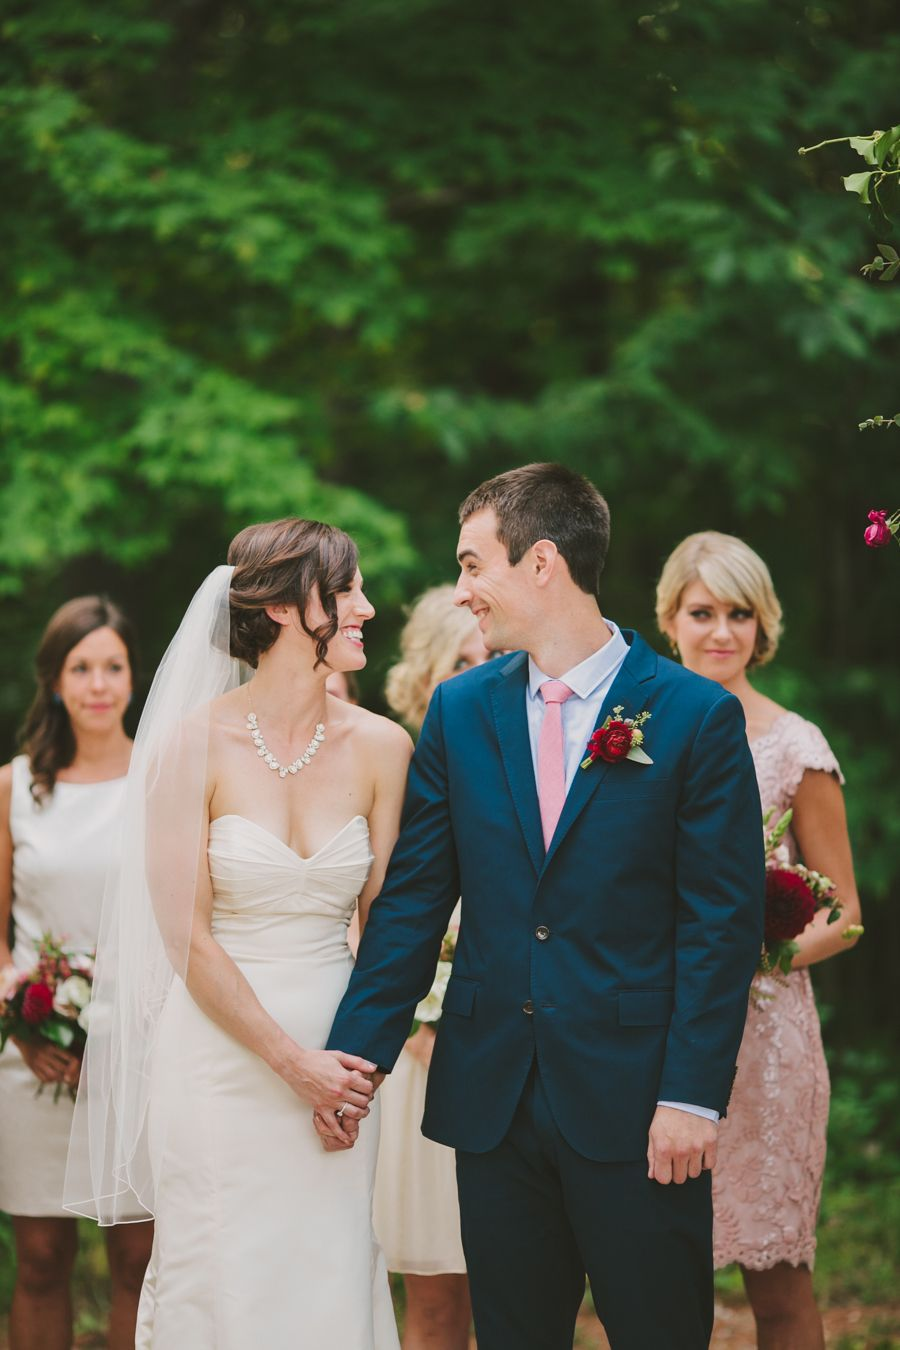 Jcrew wedding dress  Elegant Autumn Barn Wedding in Maine  Wedding dress tulle Autumn